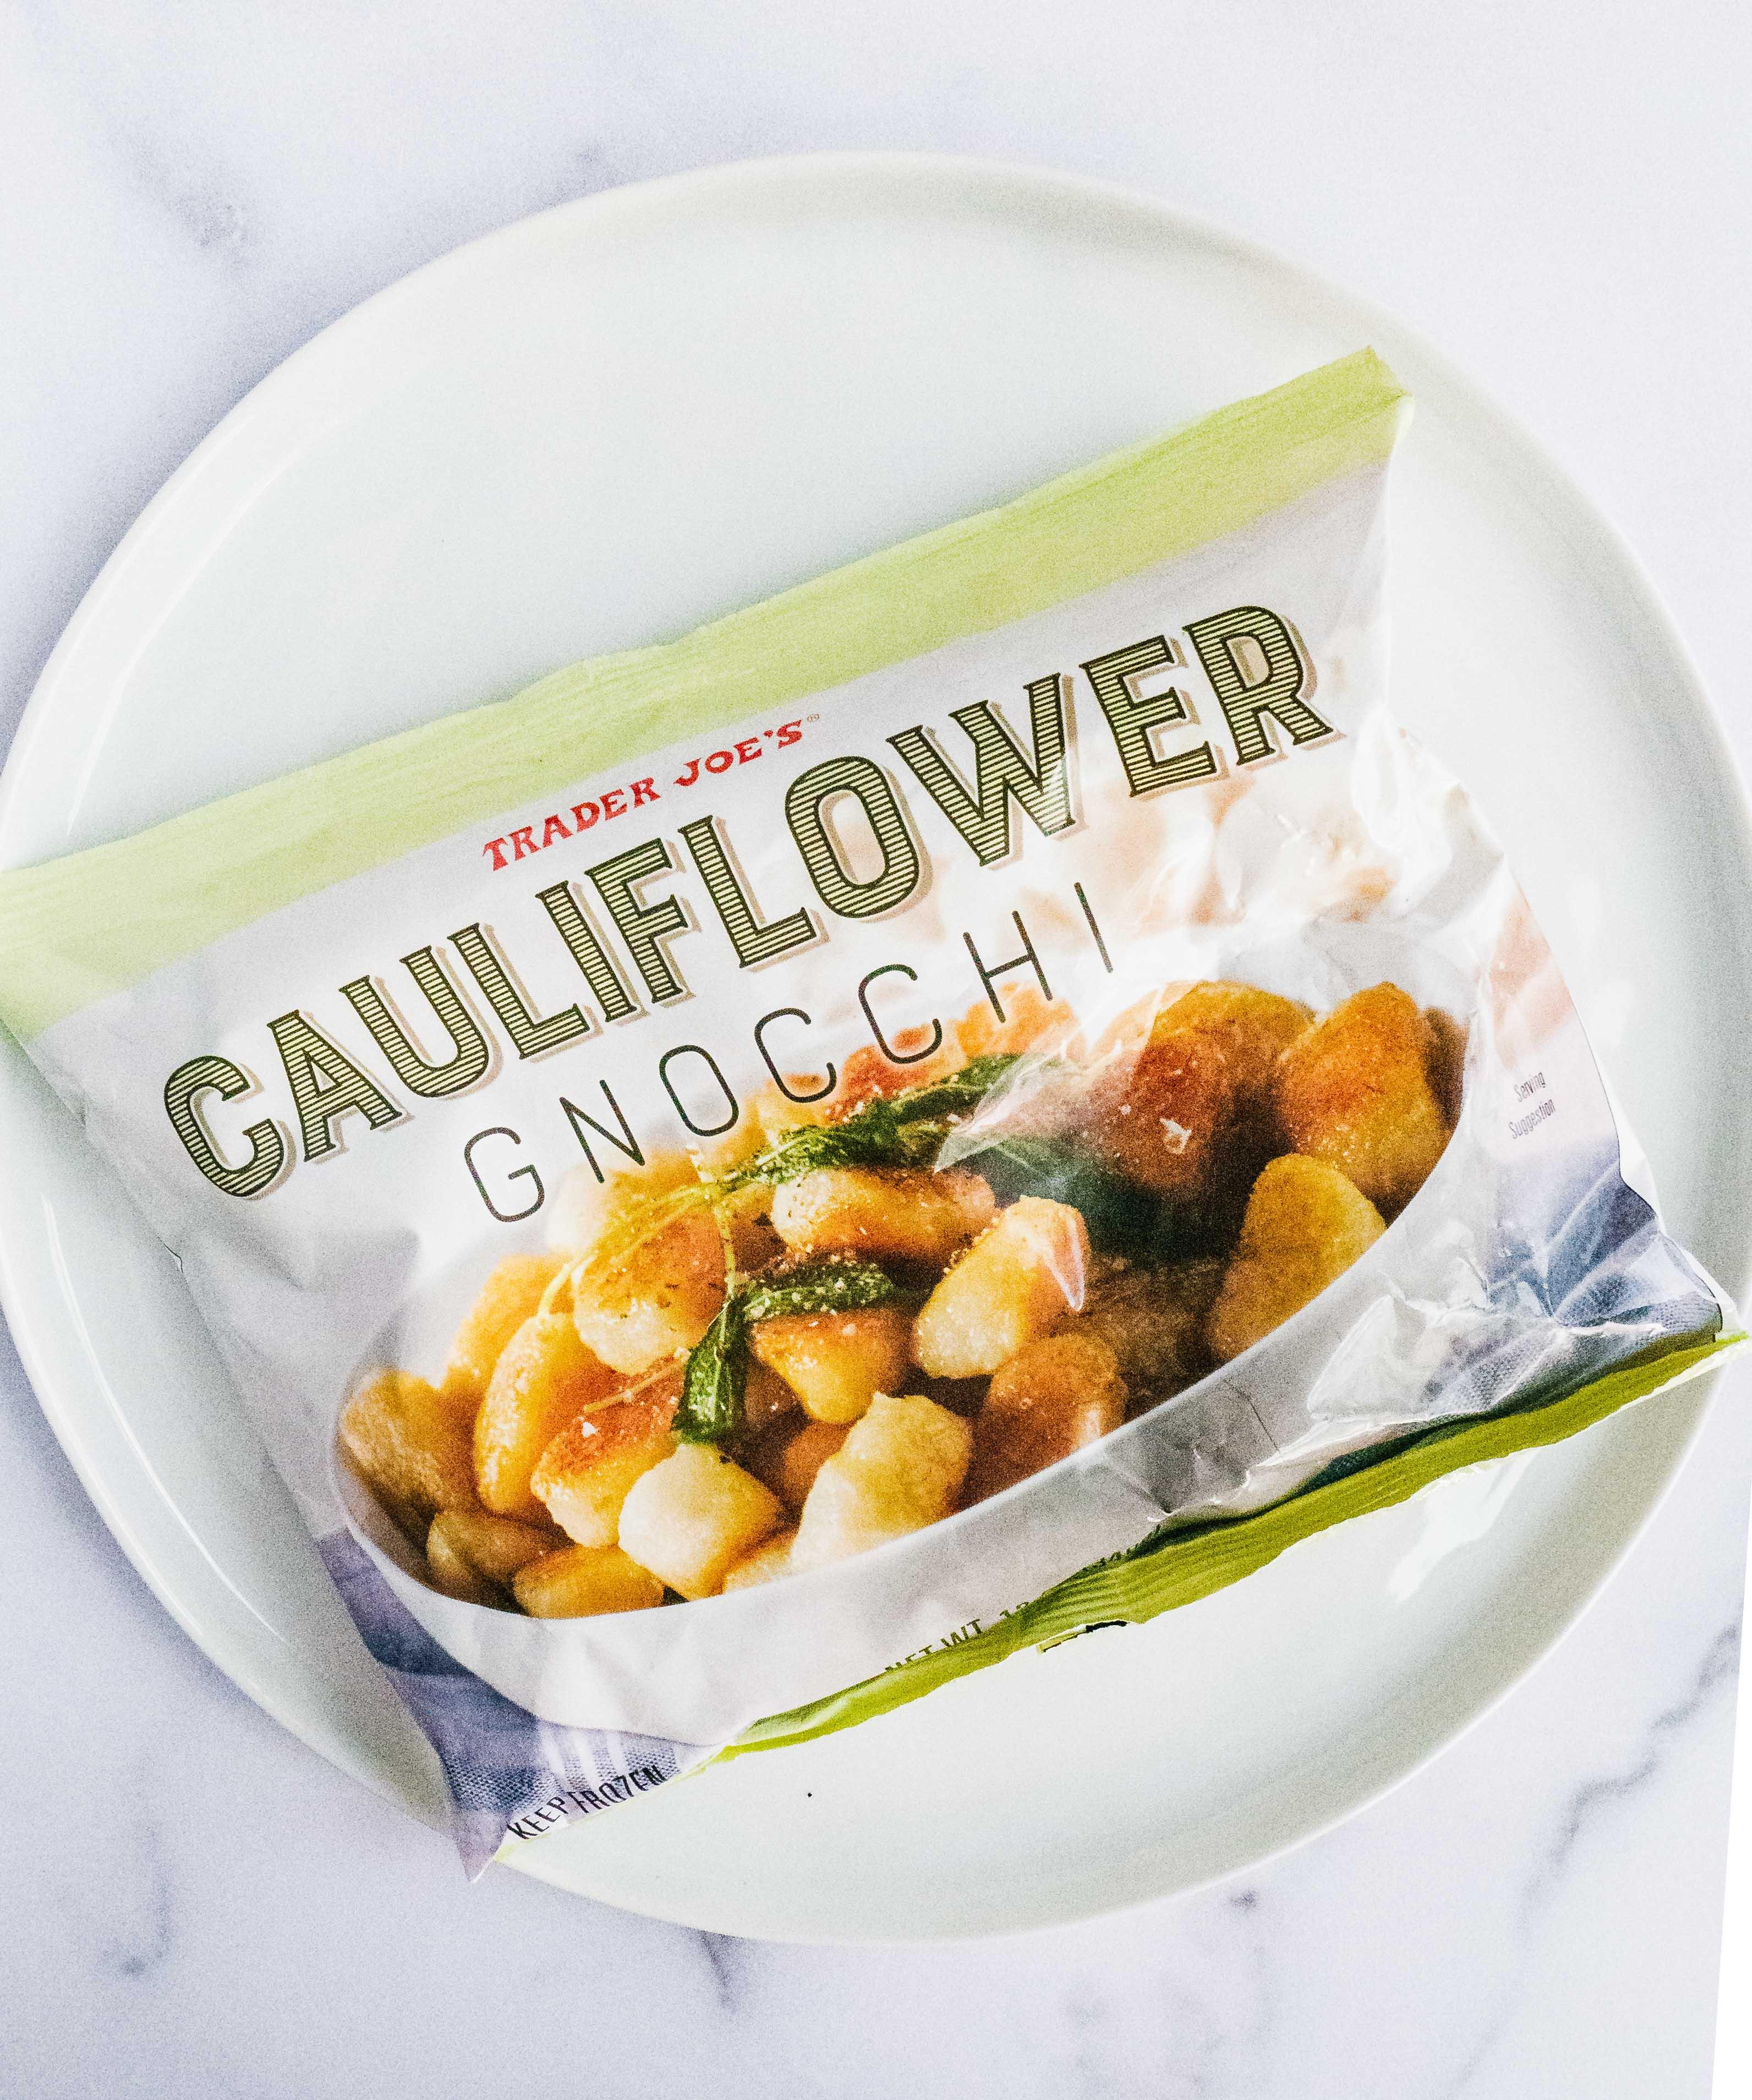 Trader Joe's Cauliflower gnocchi in a bag